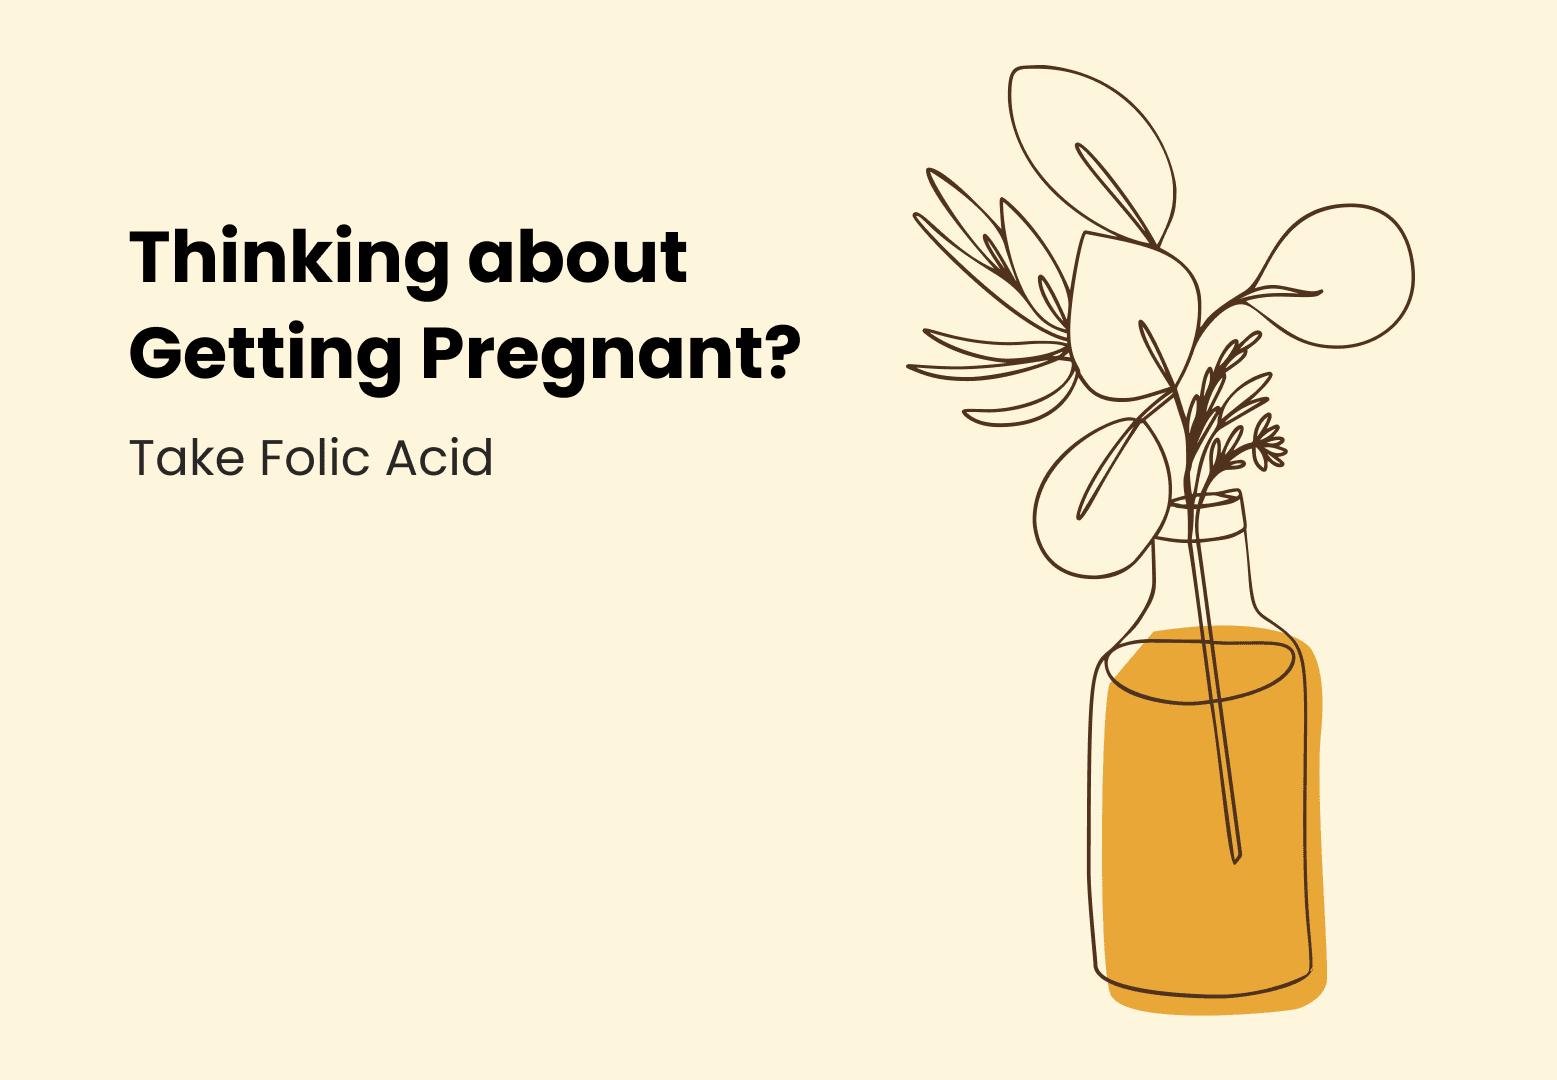 Thinking About Getting Pregnant? Take Folic Acid